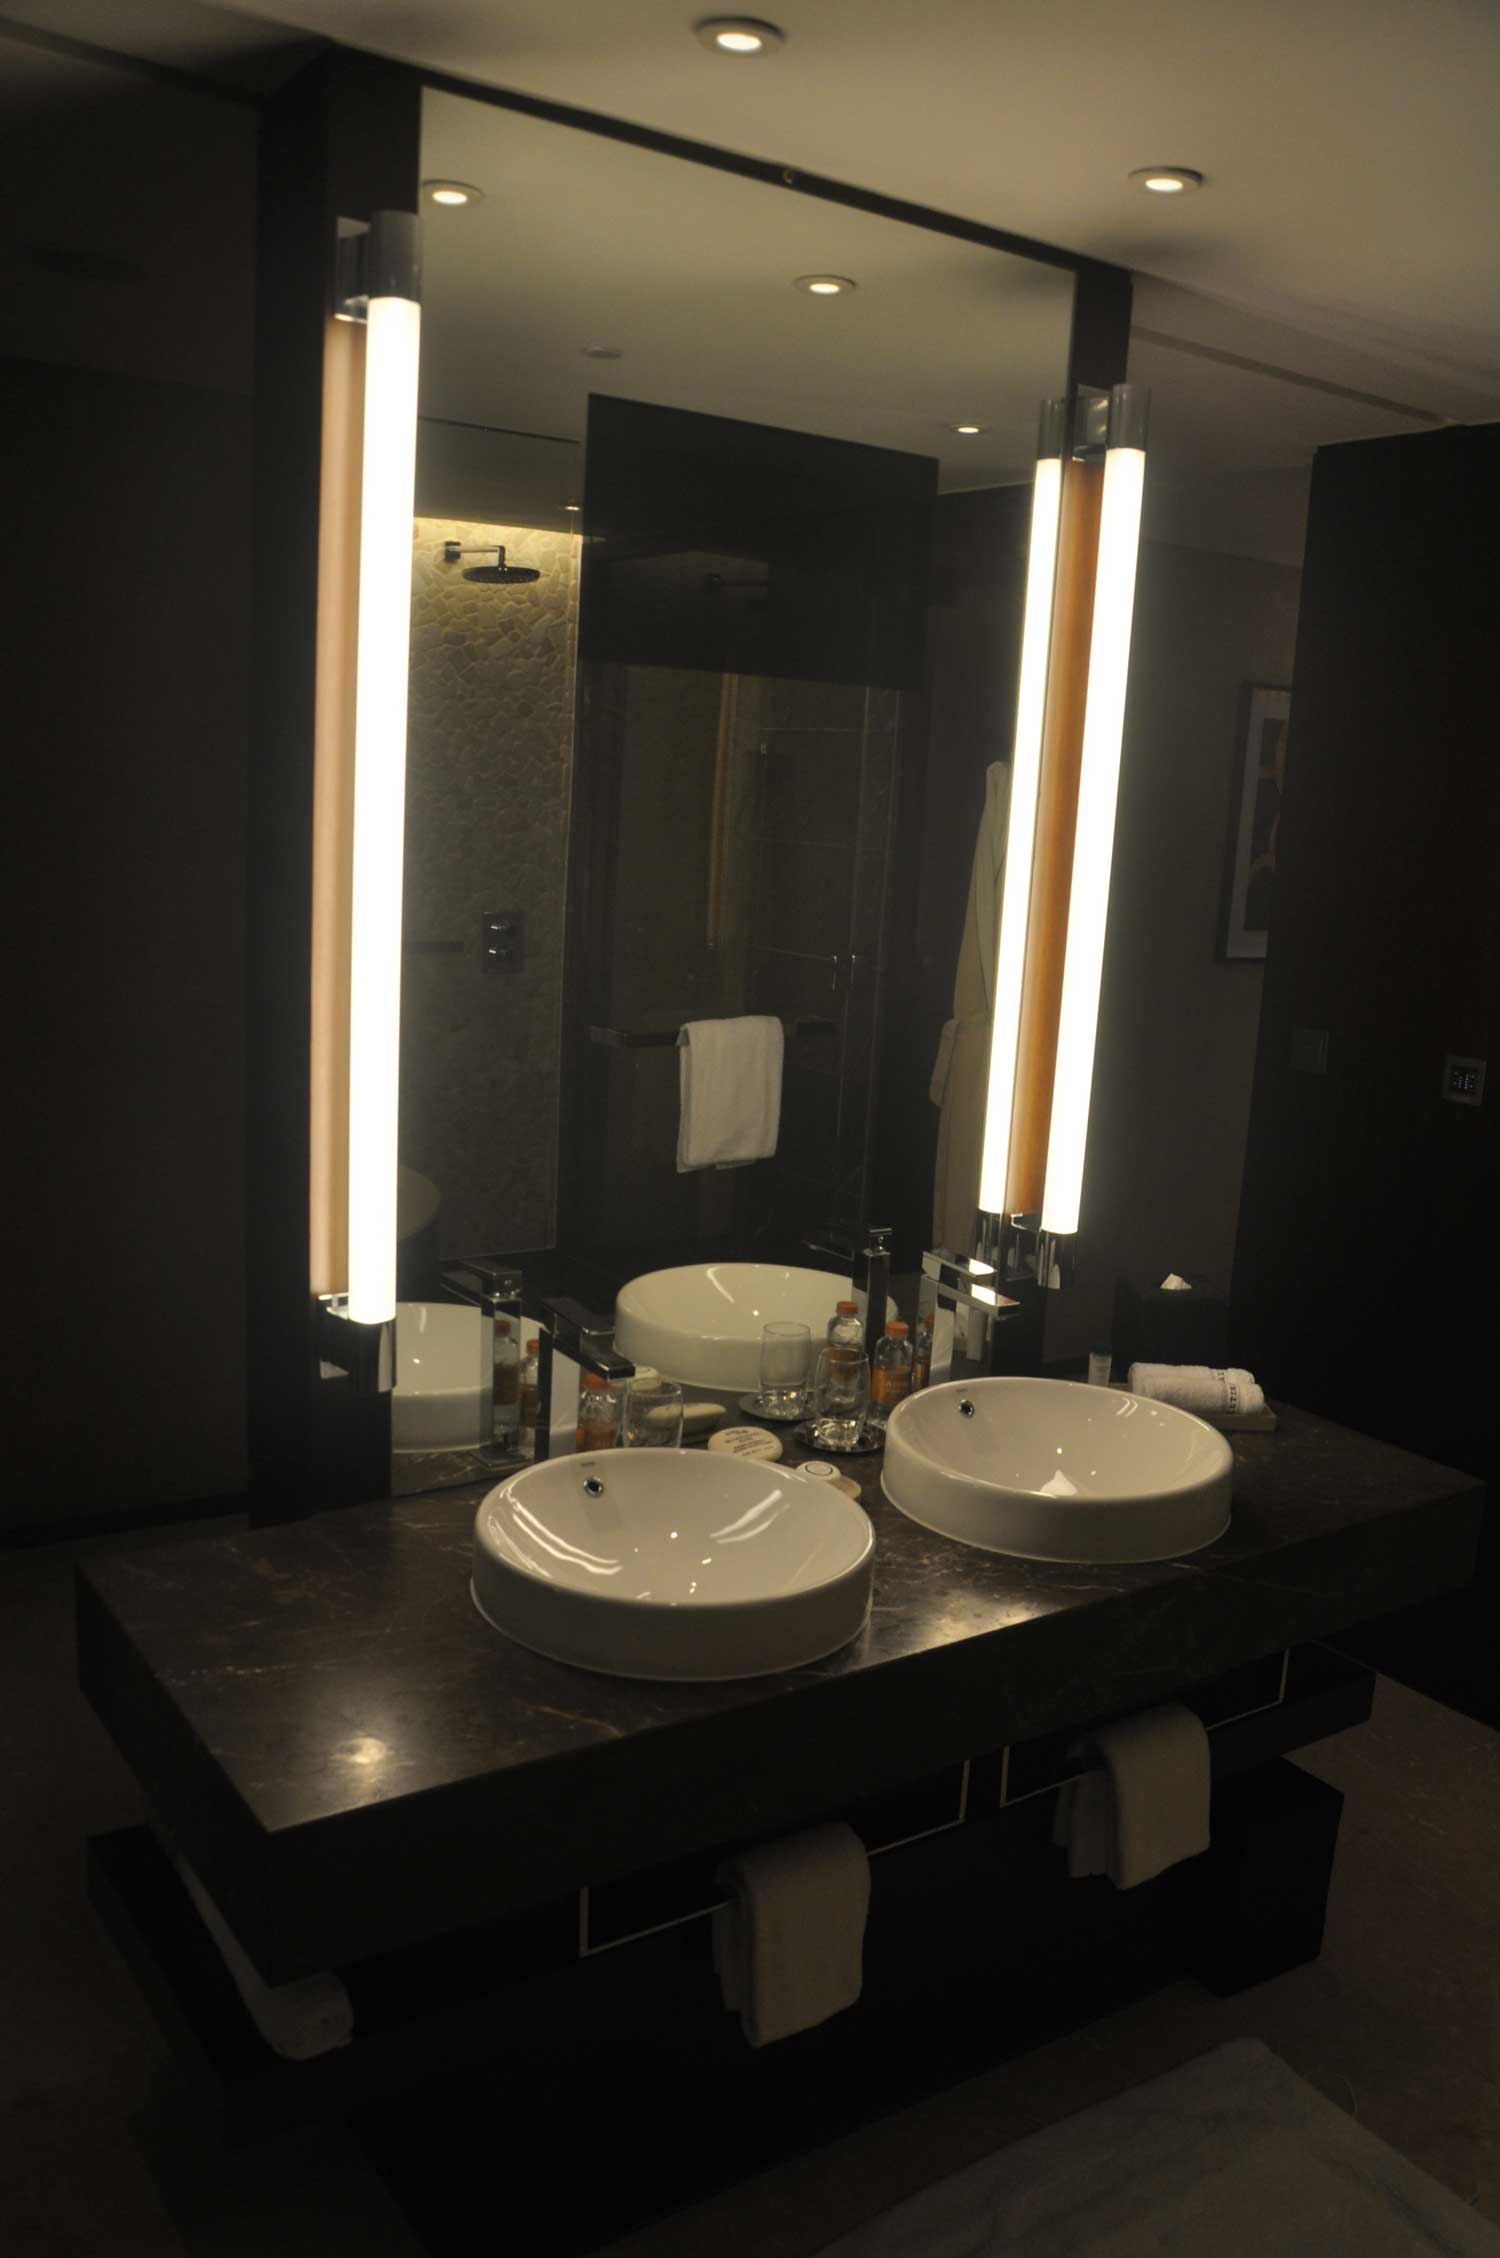 Altira Macau Waterfront King bathroom mirror and sink